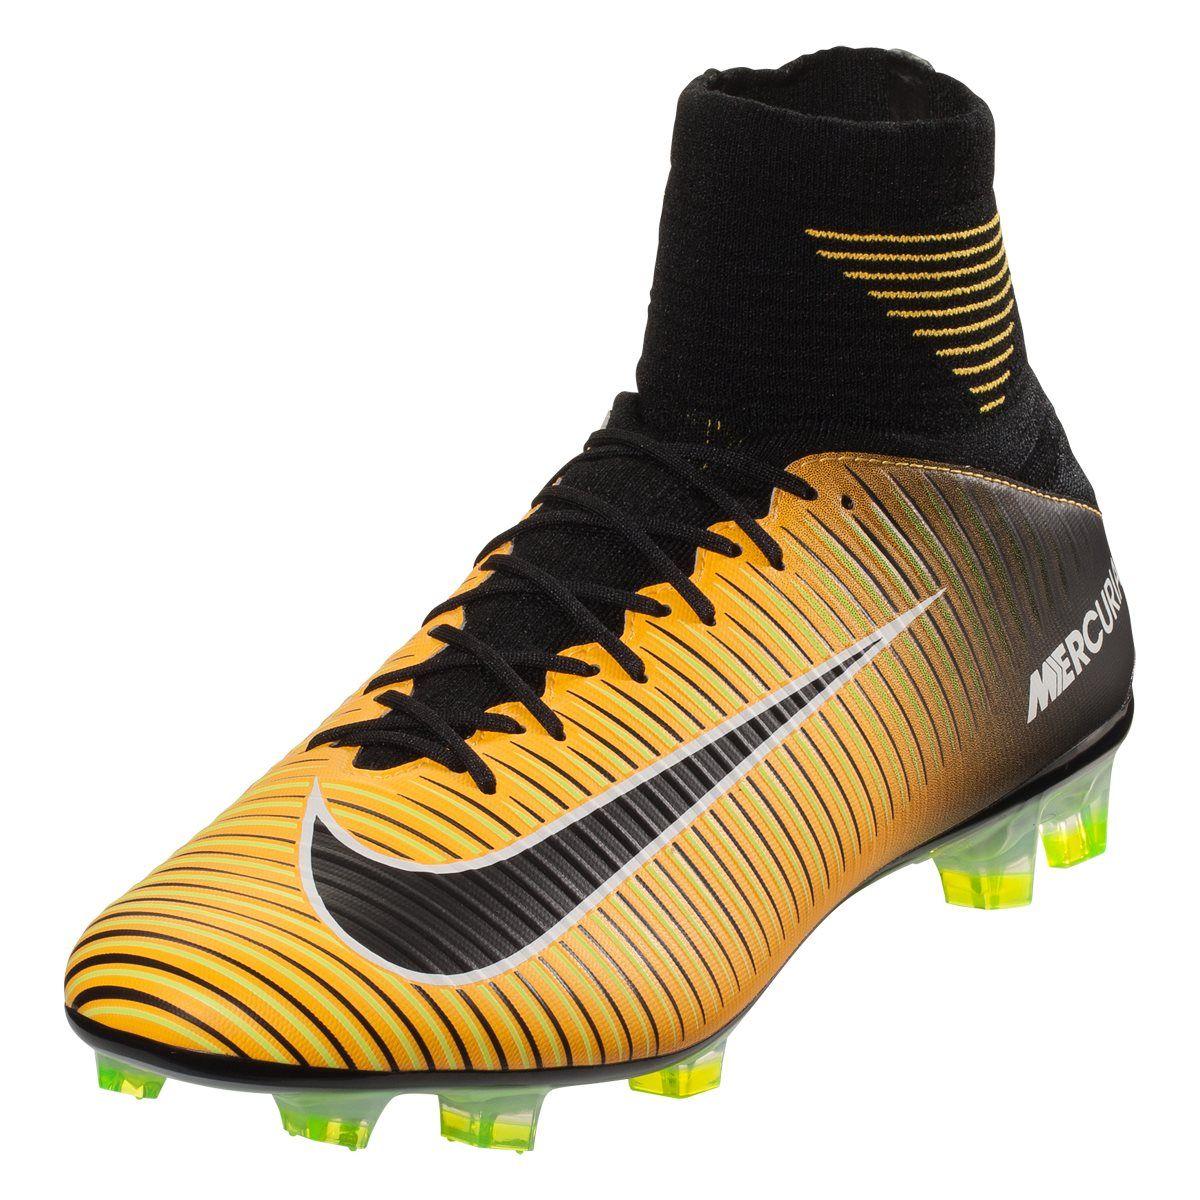 Nike Mercurial FG Superfly V FG Mercurial Soccer Cleat Laser Orange/Blanc/Noir 4282ec